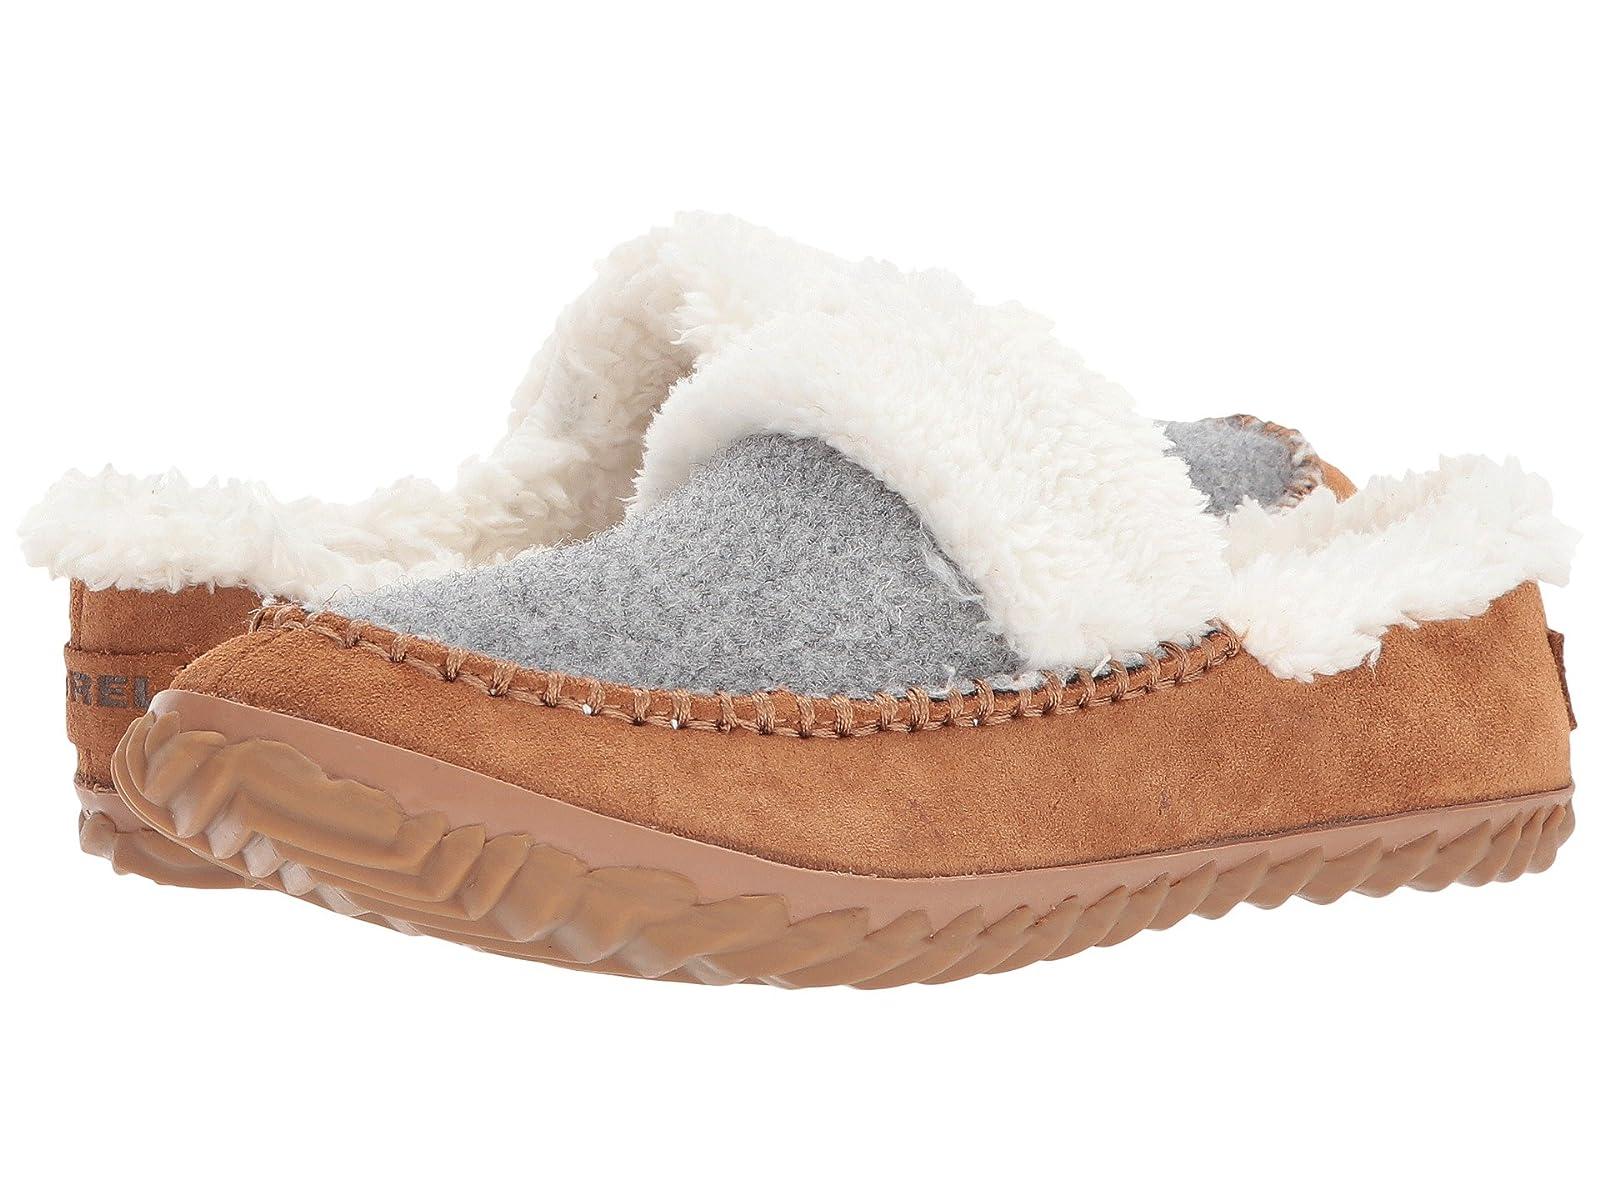 SOREL Out N About SlideAtmospheric grades have affordable shoes